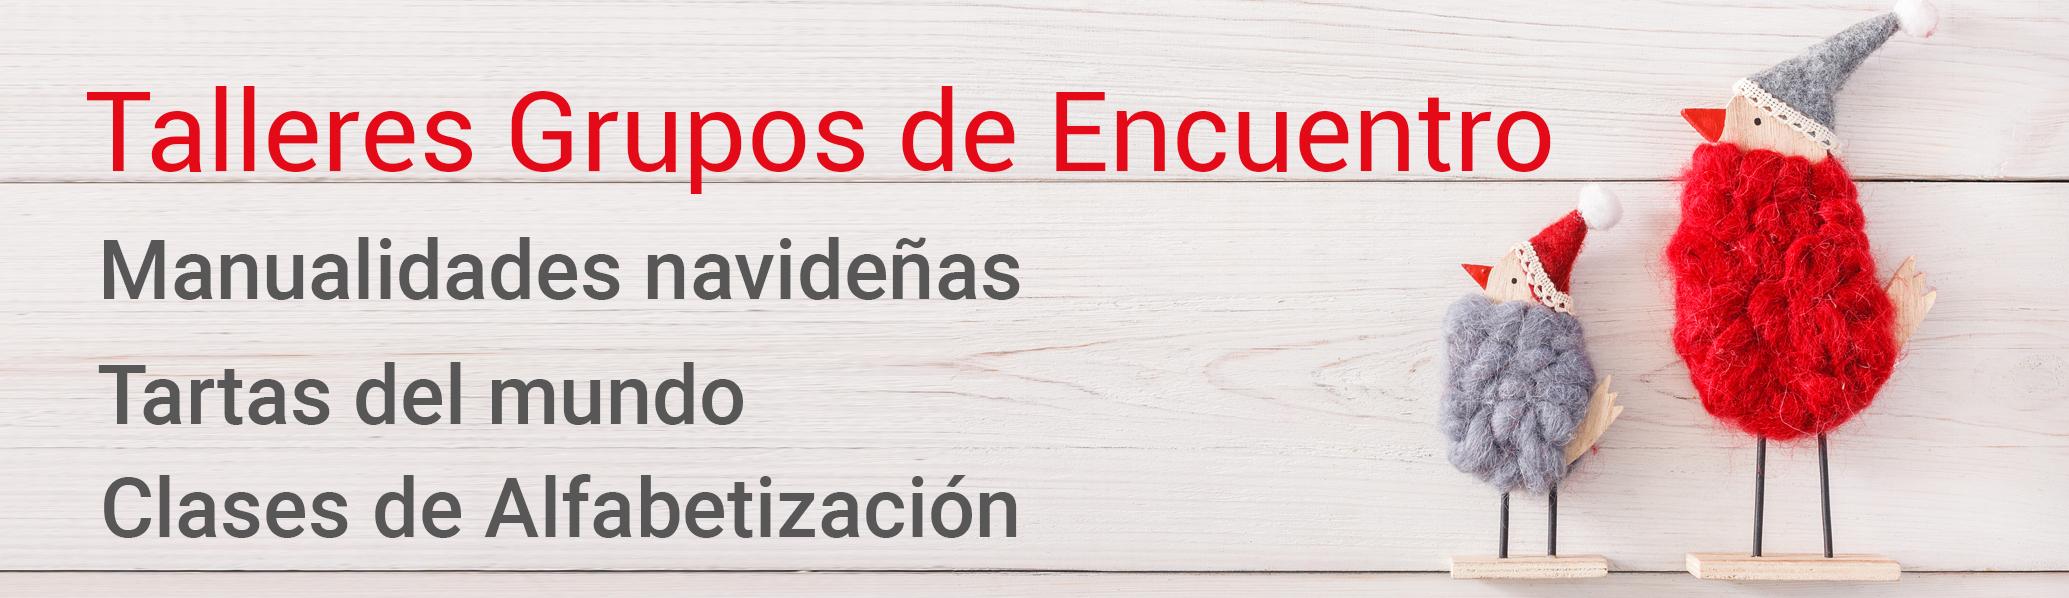 banner_GRUPOS_ENCUENTRO